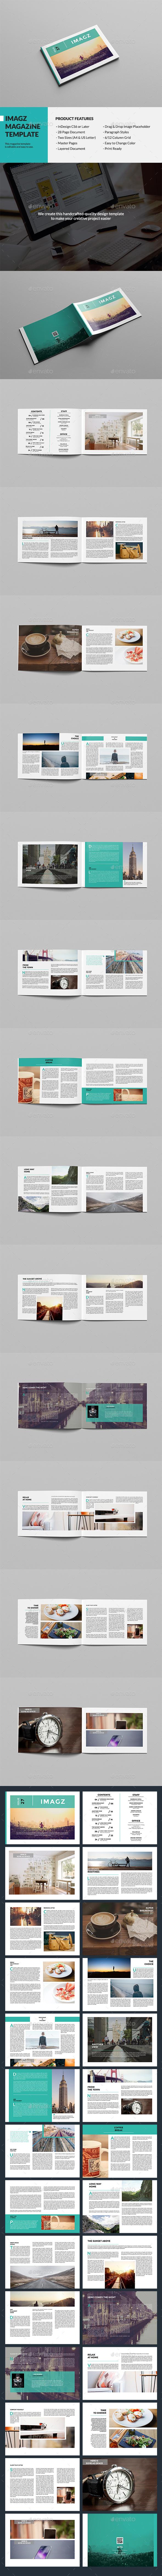 Imagz Landscape Magazine - Magazines Print Templates